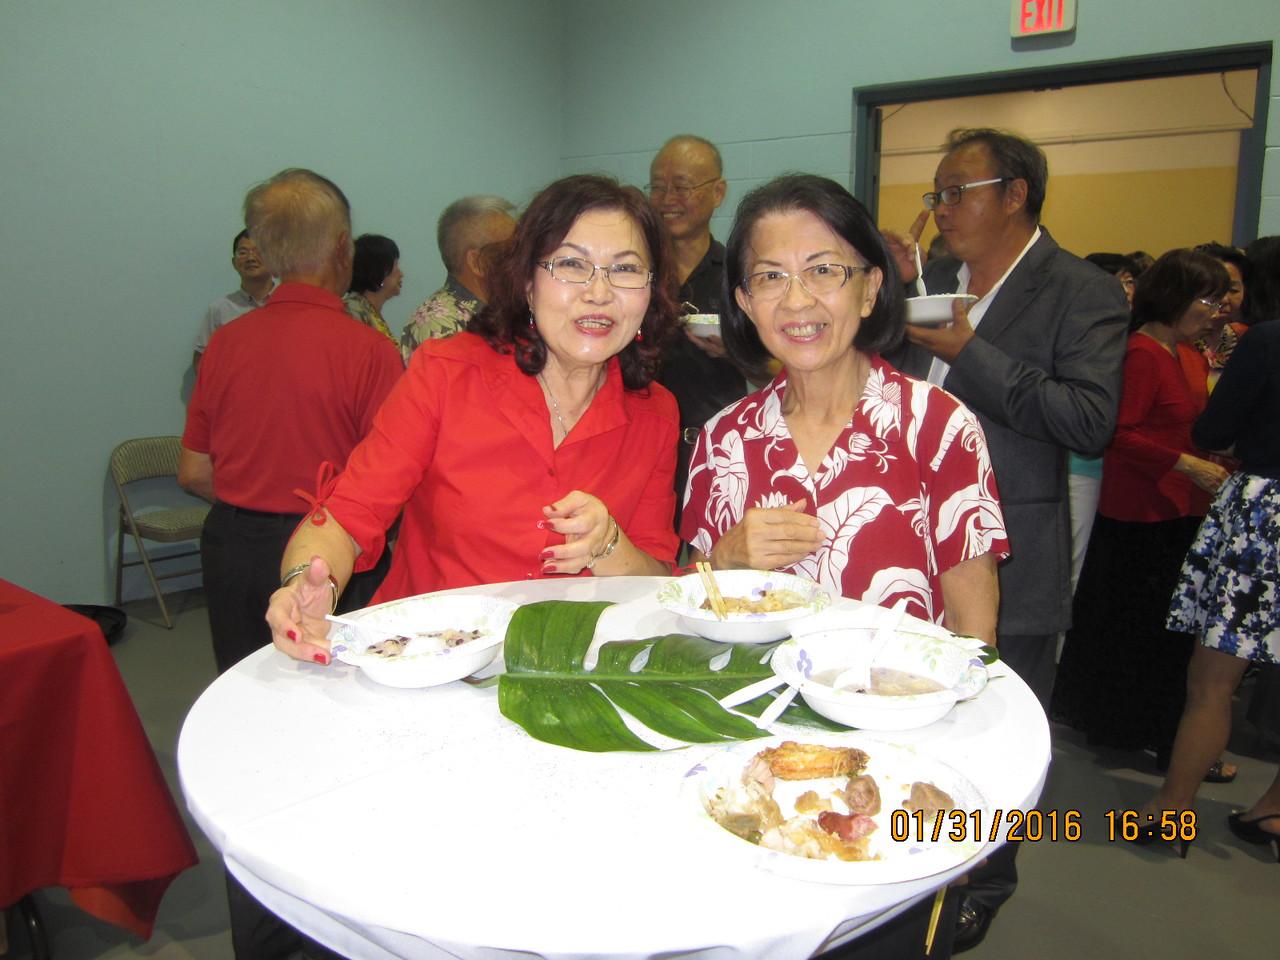 LiShueh with friend